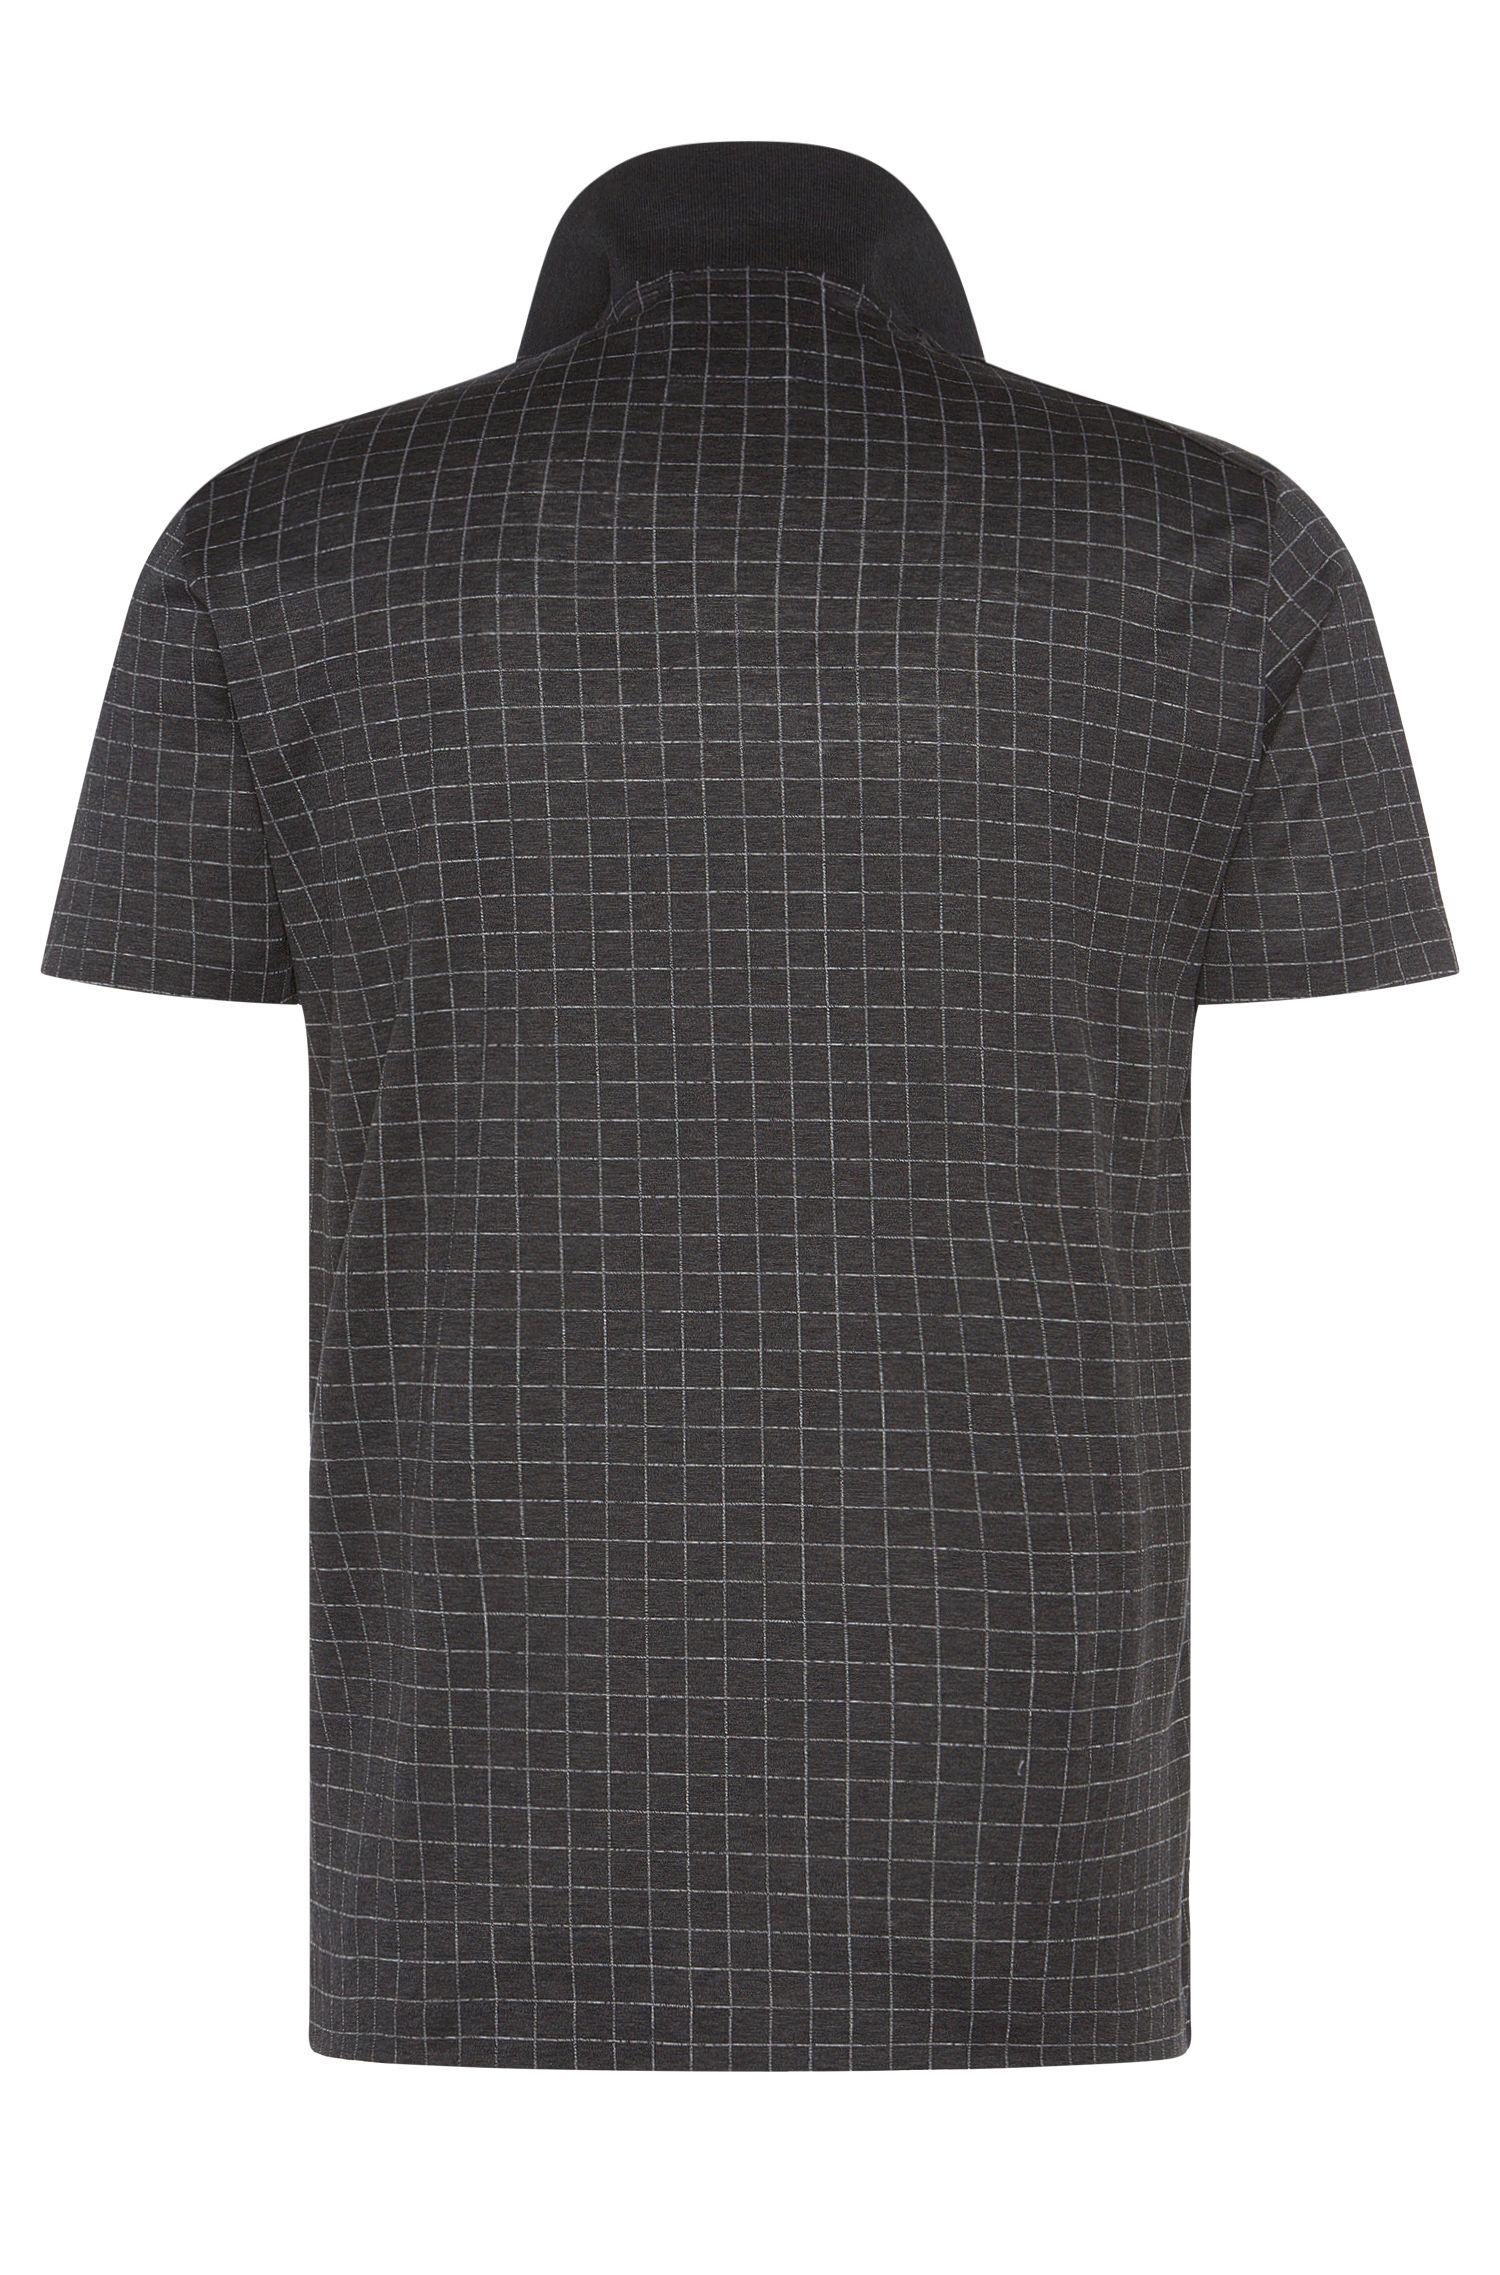 Kariertes Regular-Fit Tailored Poloshirt aus Baumwolle: 'T-Perry 07'